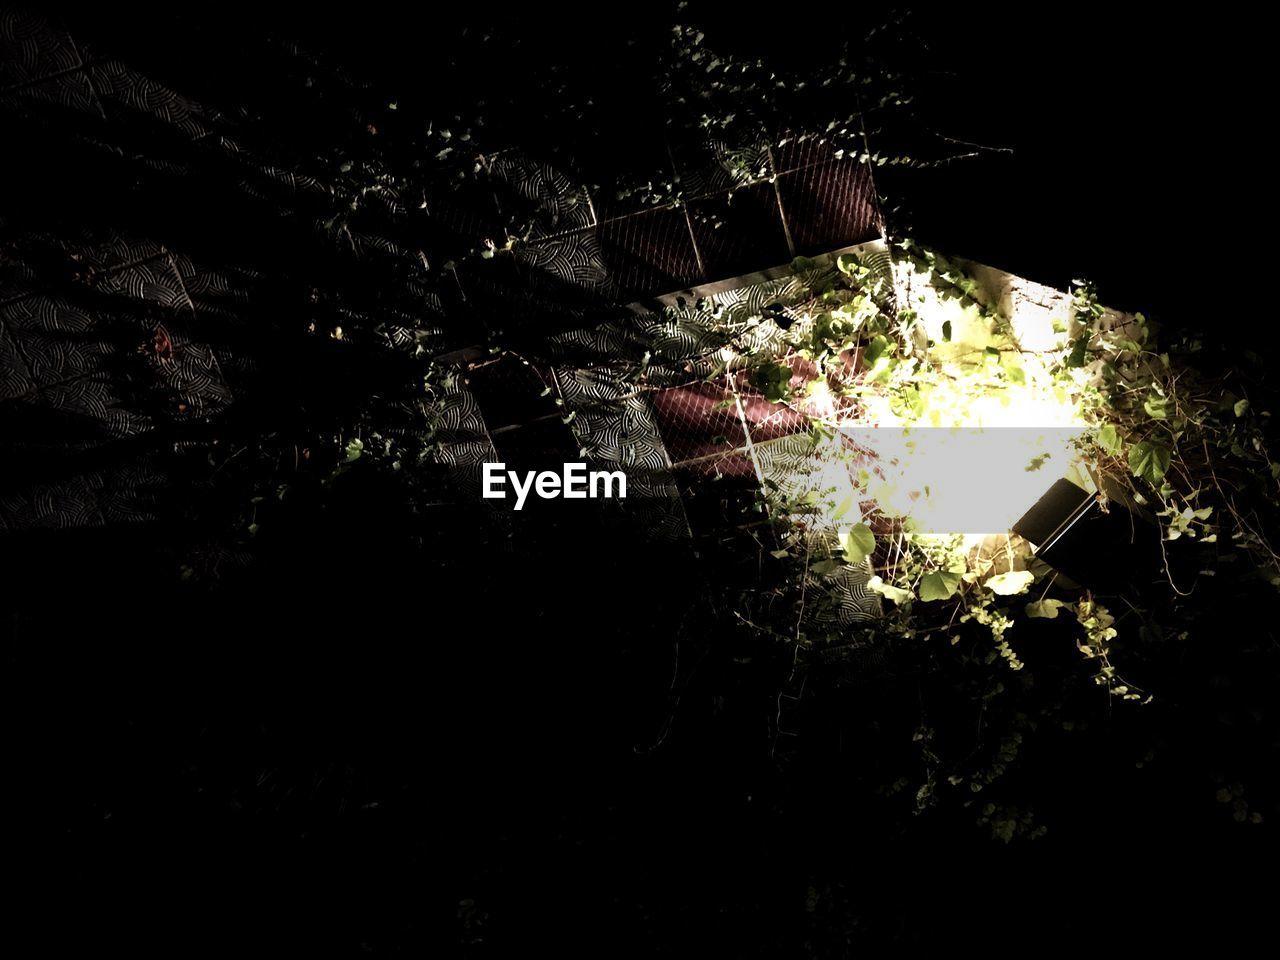 night, no people, outdoors, illuminated, close-up, nature